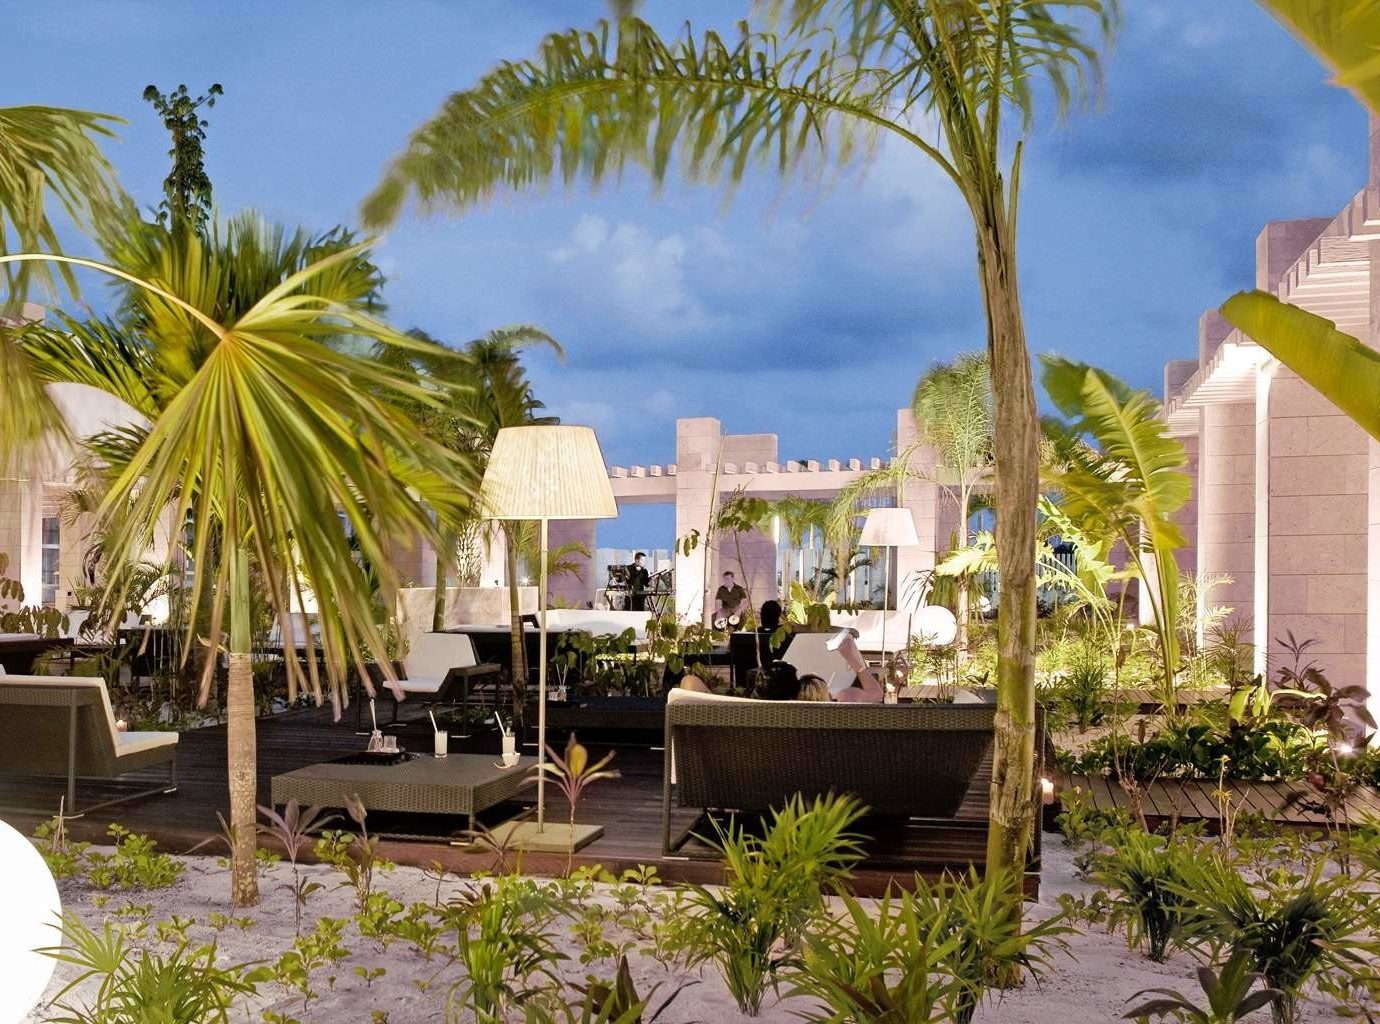 Hotels tree palm plant outdoor Resort vacation arecales estate Garden condominium real estate restaurant palm family flower hacienda decorated furniture